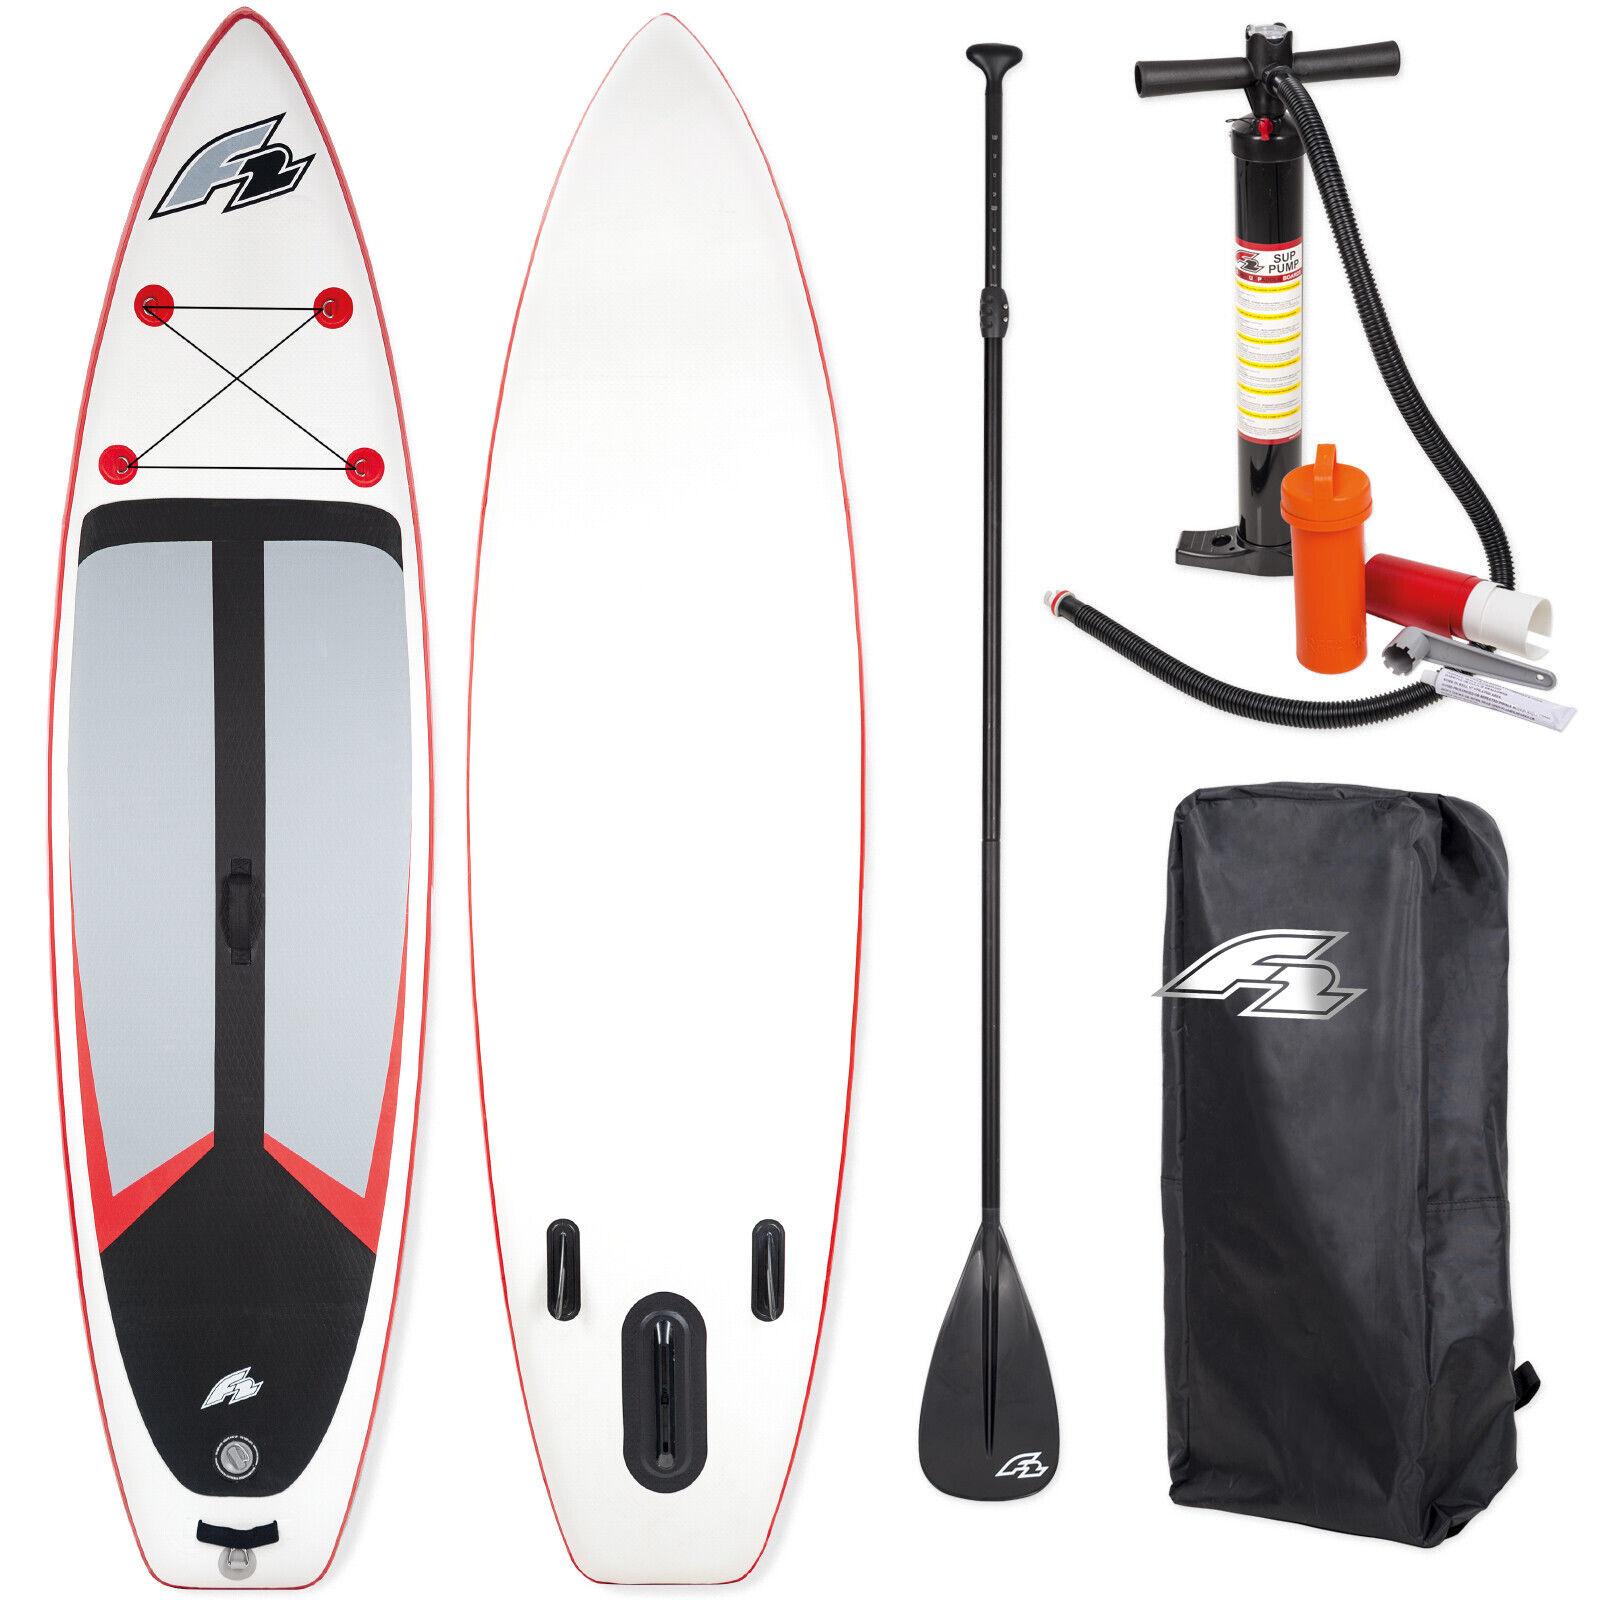 F2 sup vega 11,5 stand up paddle board completamente set 350 cm hinchable 2019